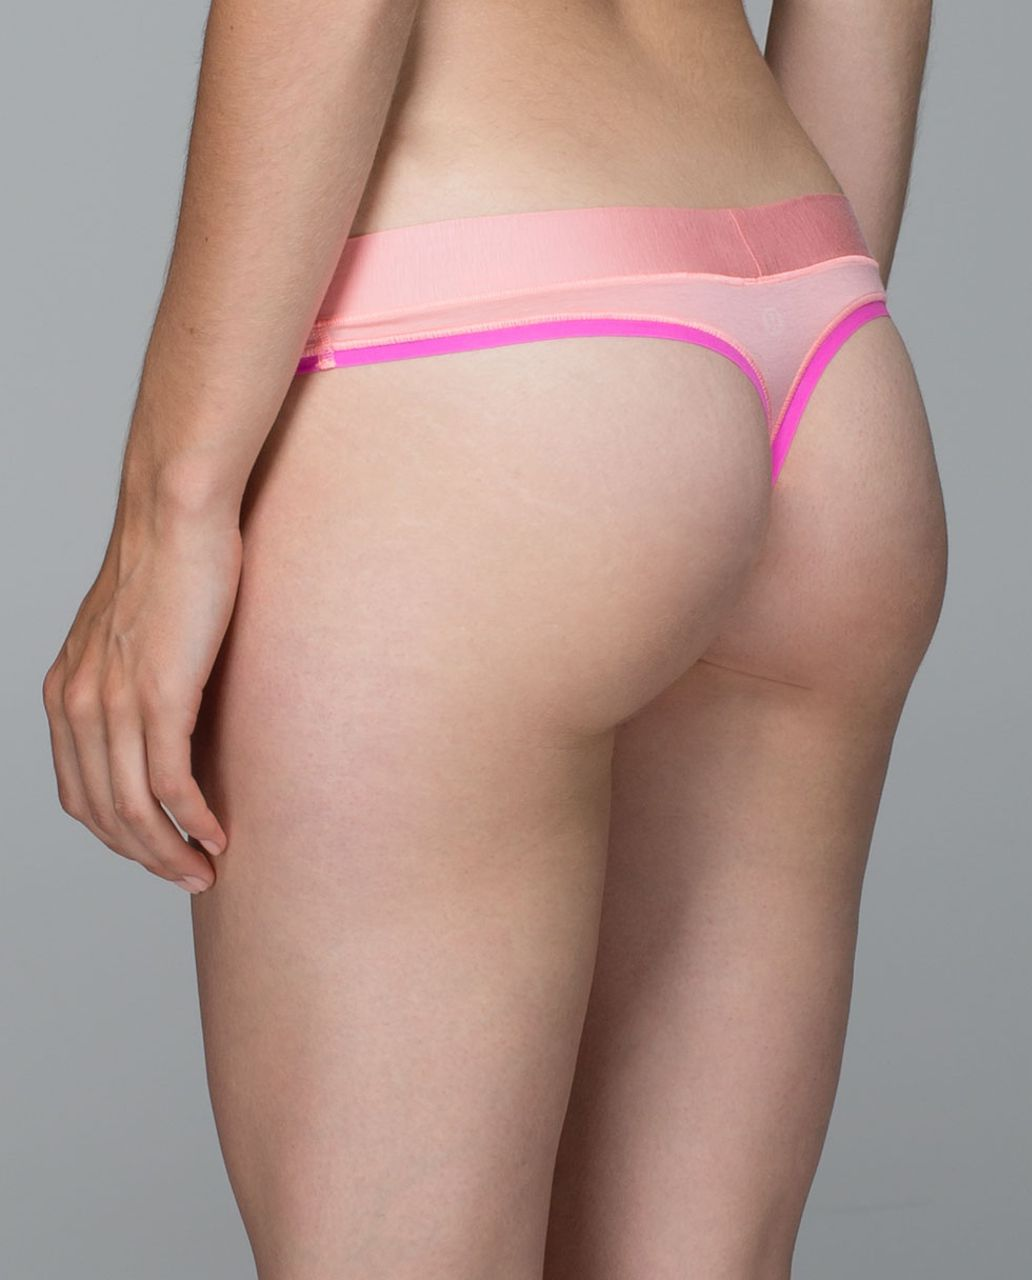 Lululemon Mula Bandhawear Thong - Bleached Coral / Pow Pink Light